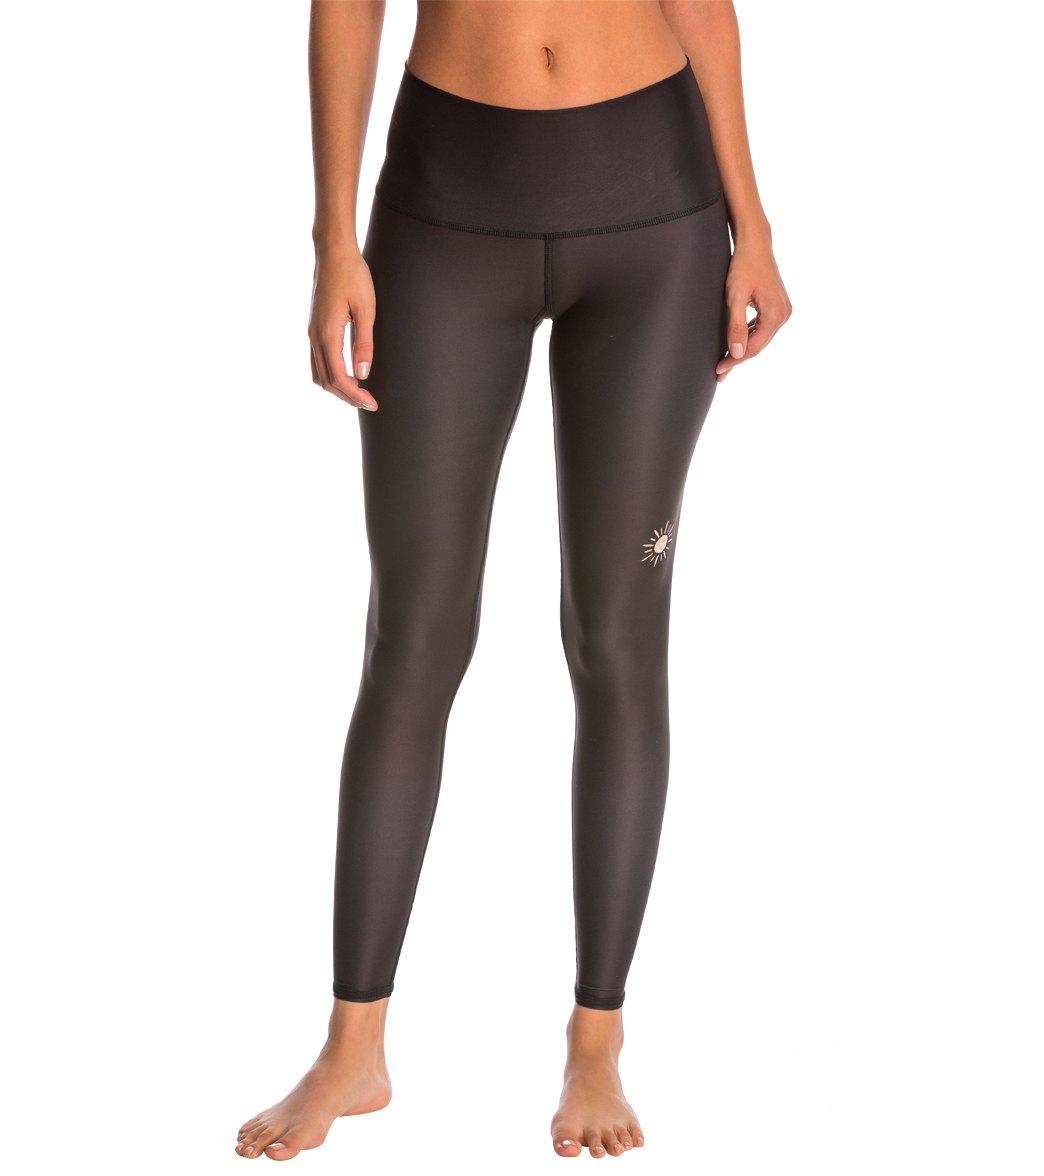 139d4357e8b1b Teeki New Moon Black Hot Pants at YogaOutlet.com - Free Shipping